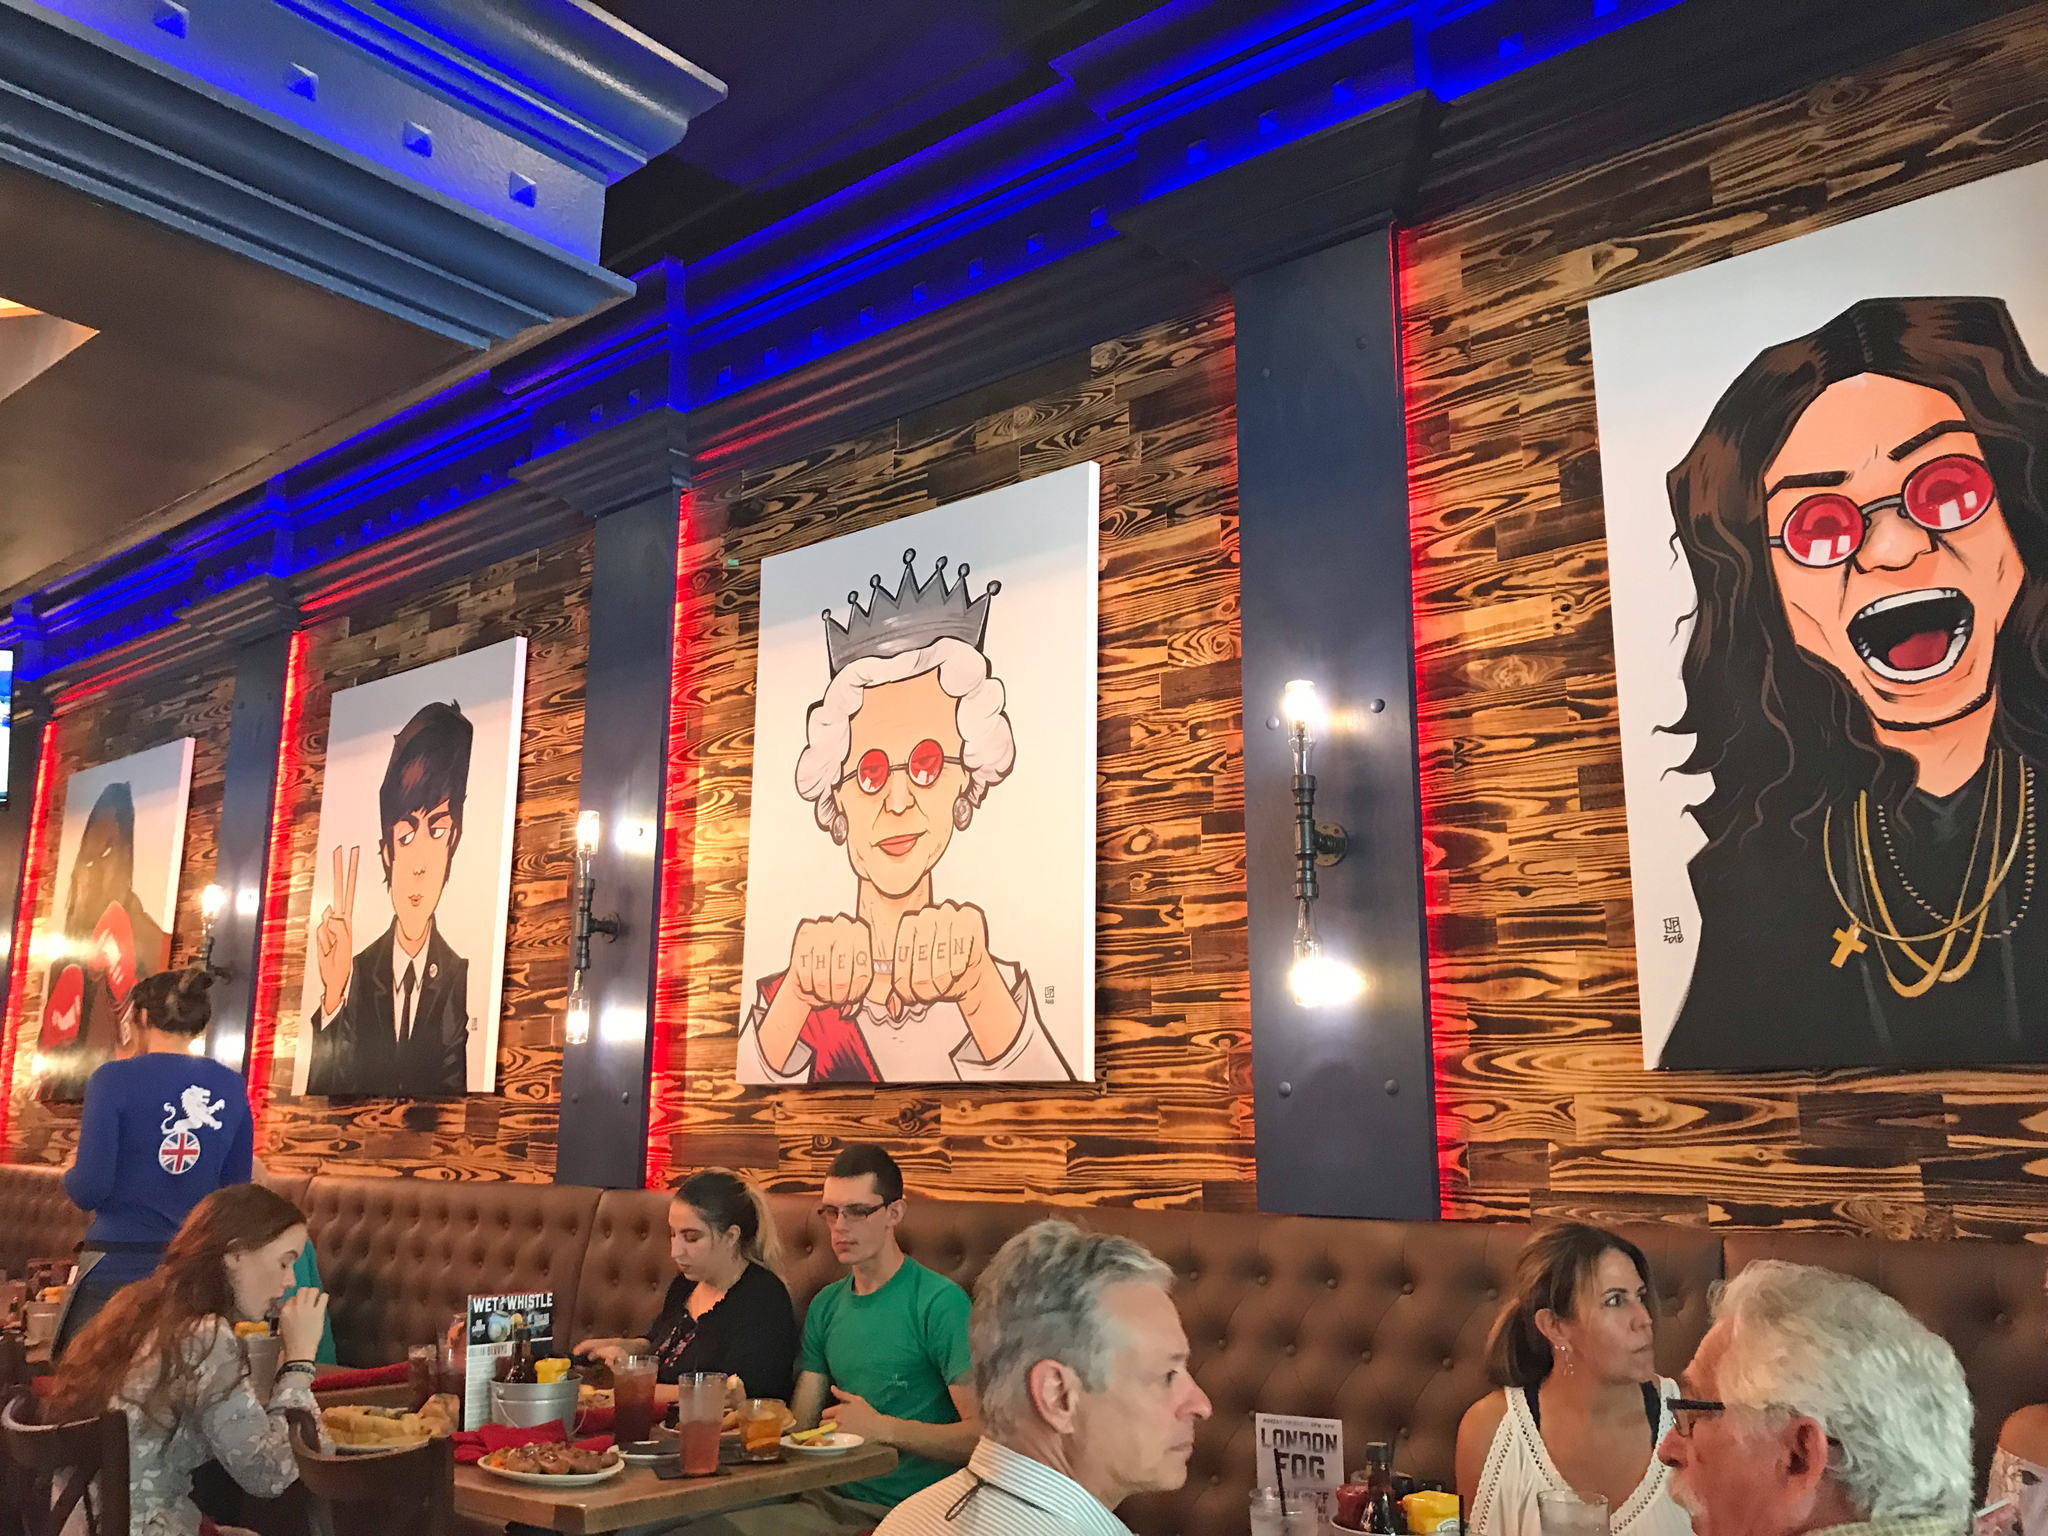 Yeoman's Celebrity Paintings